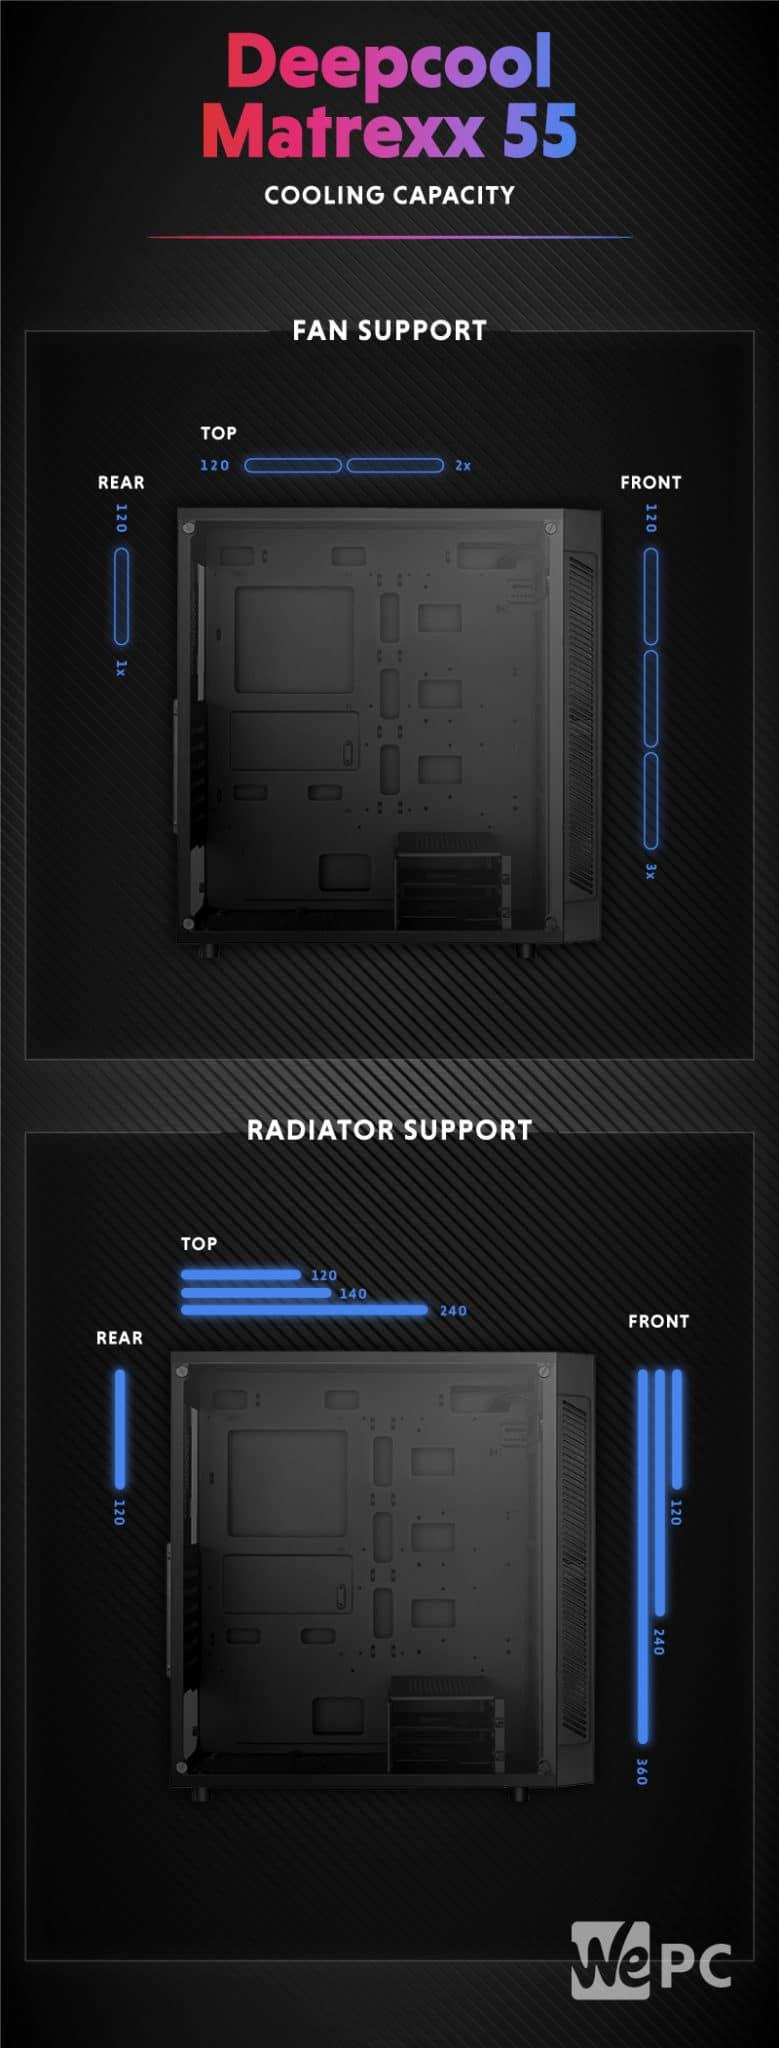 Deepcool matrexx 55 Cooling Capacity